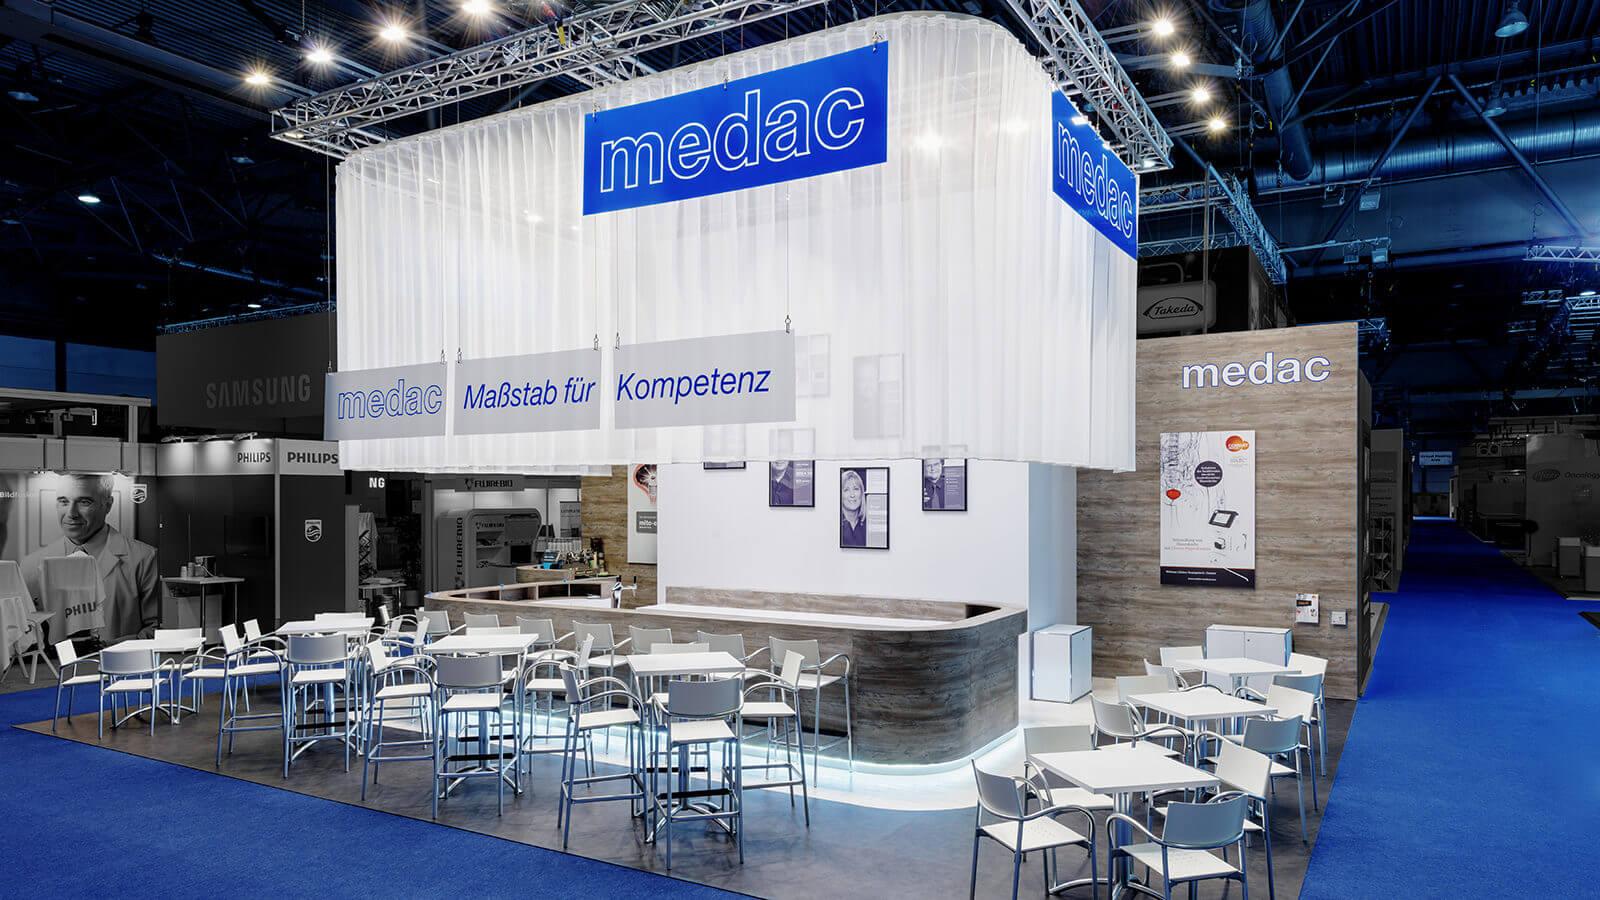 medac<br>98 m²<br>DGU-Kongress